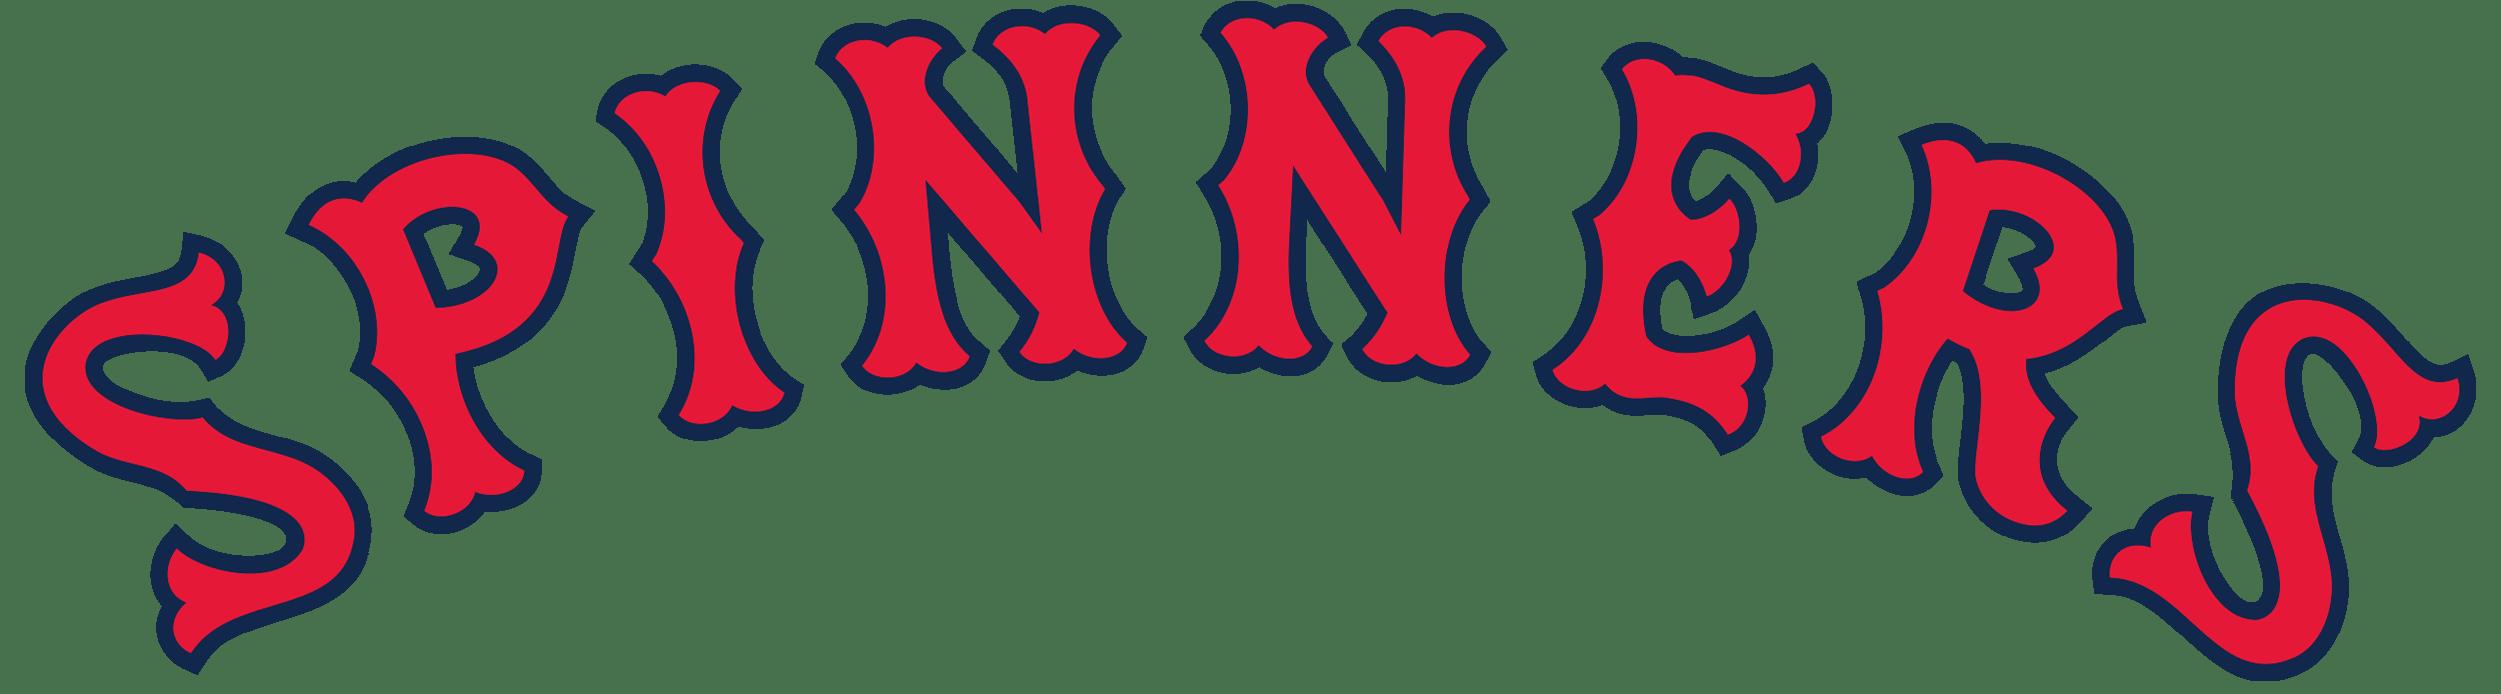 Baseball stitches clipart transparent image free library Cyclones Baseball Logo Clip Art image free library